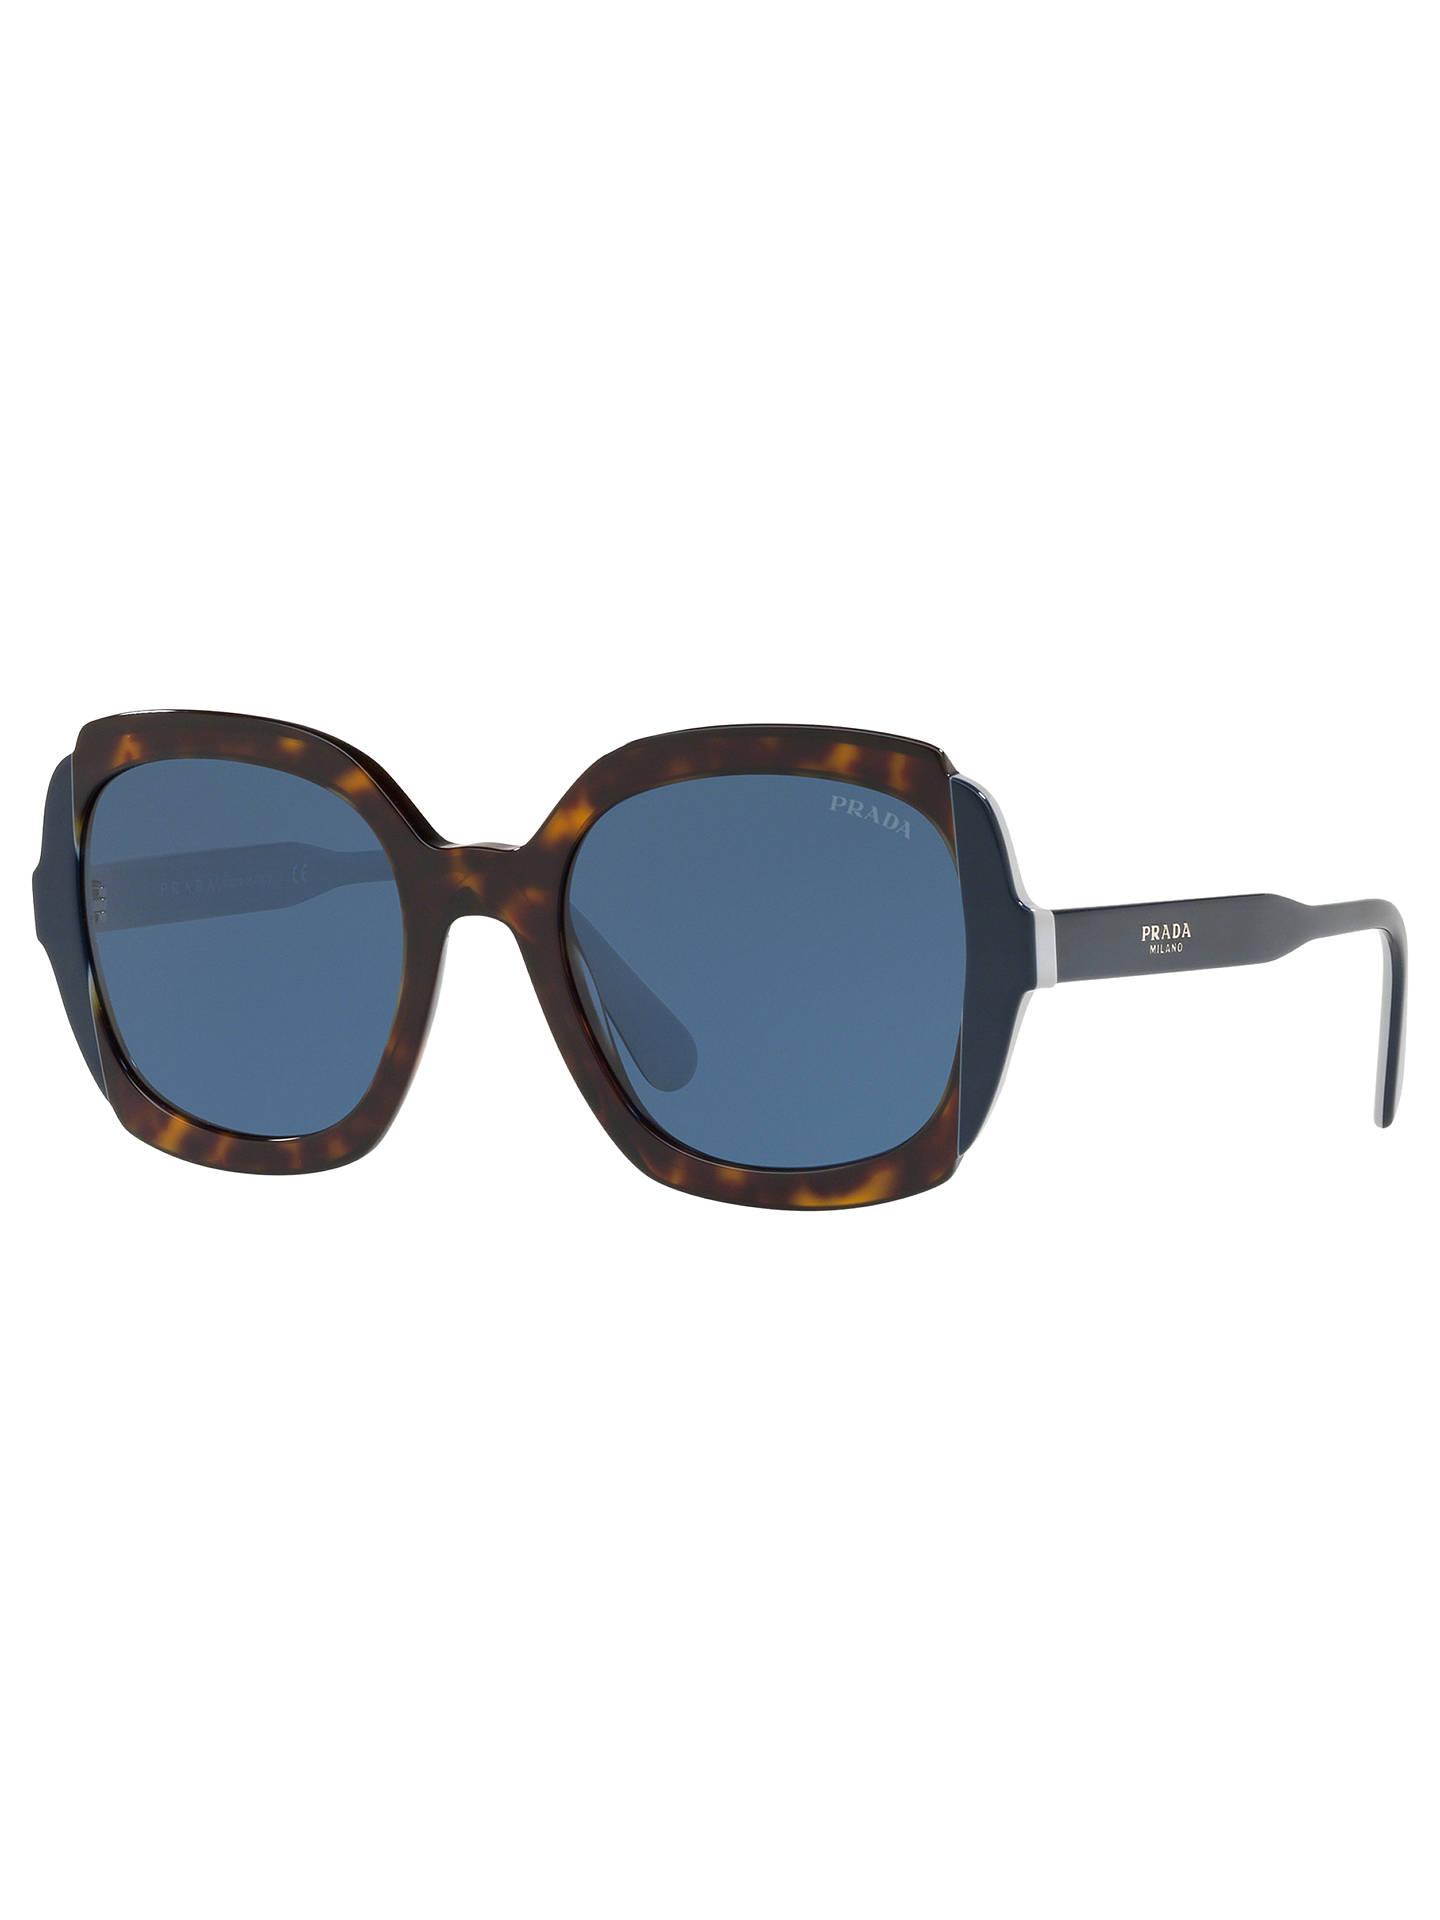 63f7619df98e Buy Prada 16US Women's Square Sunglasses, Black Online at johnlewis. ...